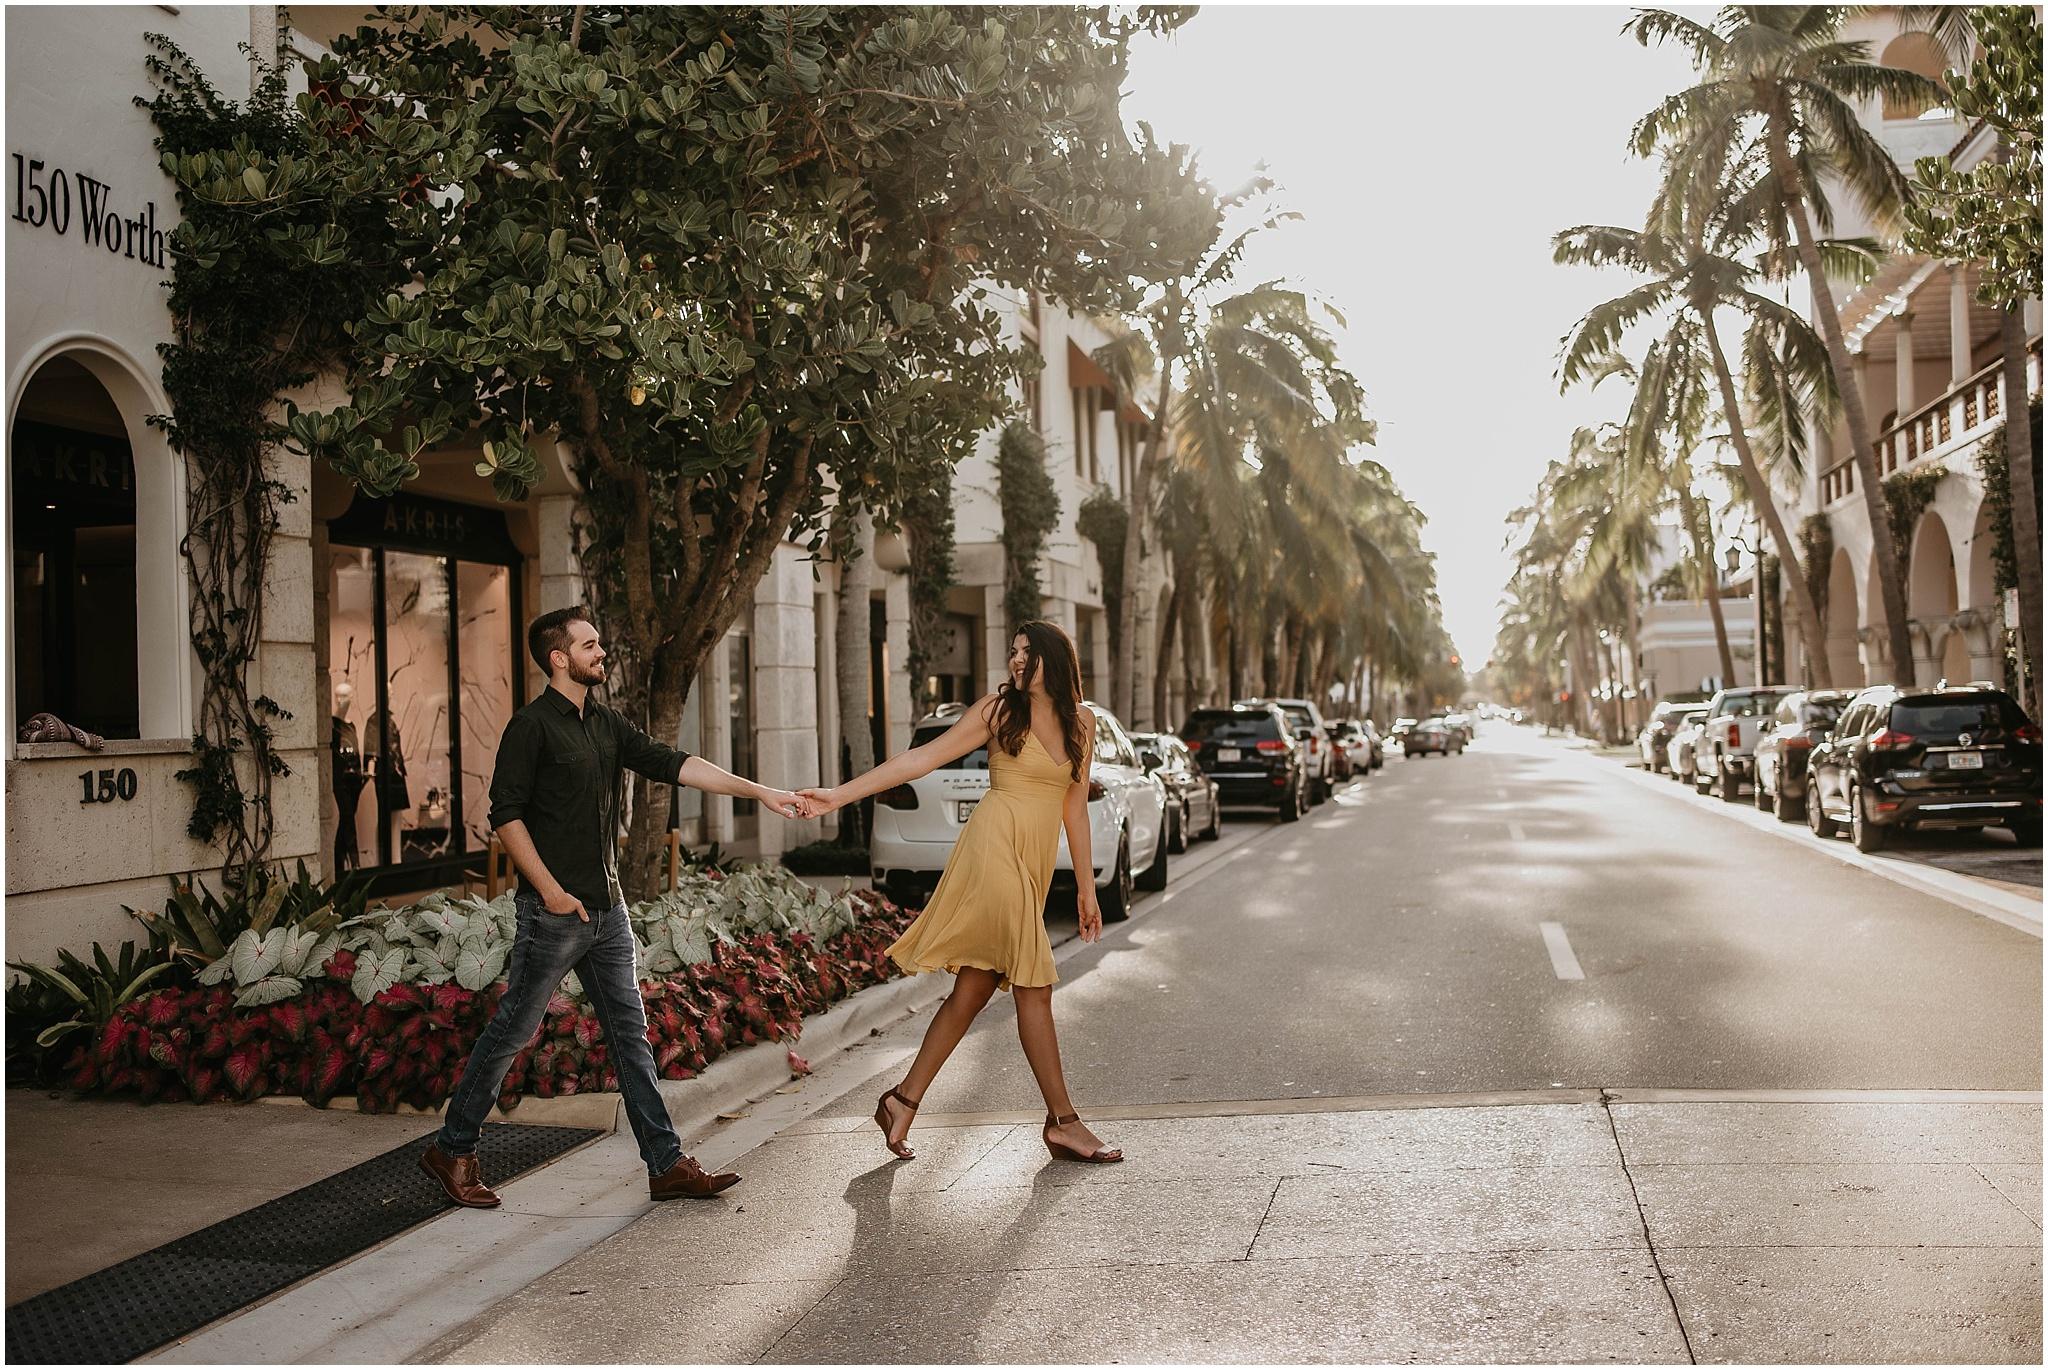 Worth-Avenue-Palm-Beach-engagement-photographer_0003.jpg